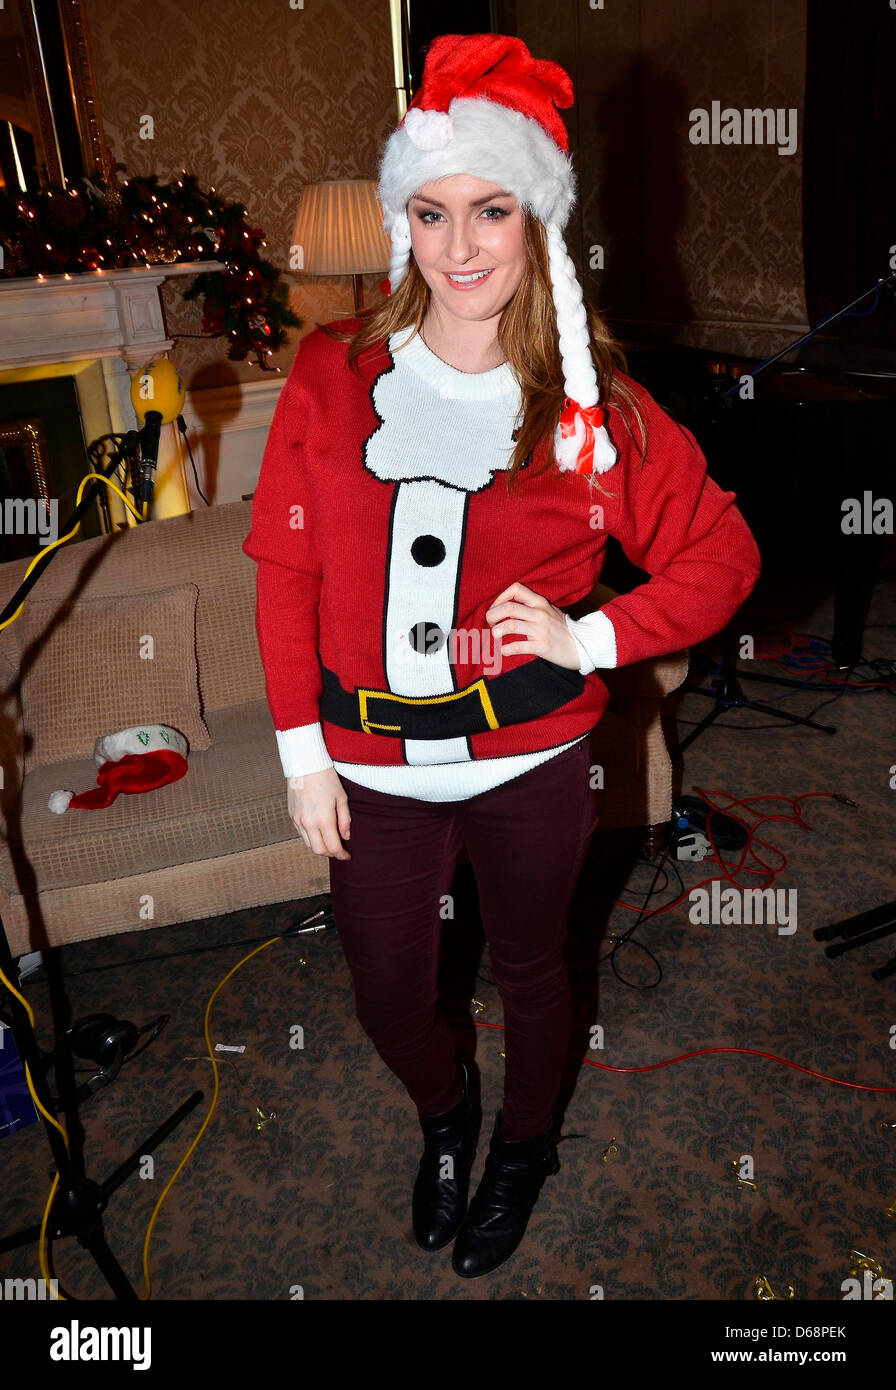 1e9539c6f012 Mairead Farrell Today FM's Christmas Tea Party Show at The Shelbourne Hotel  Dublin, Ireland -